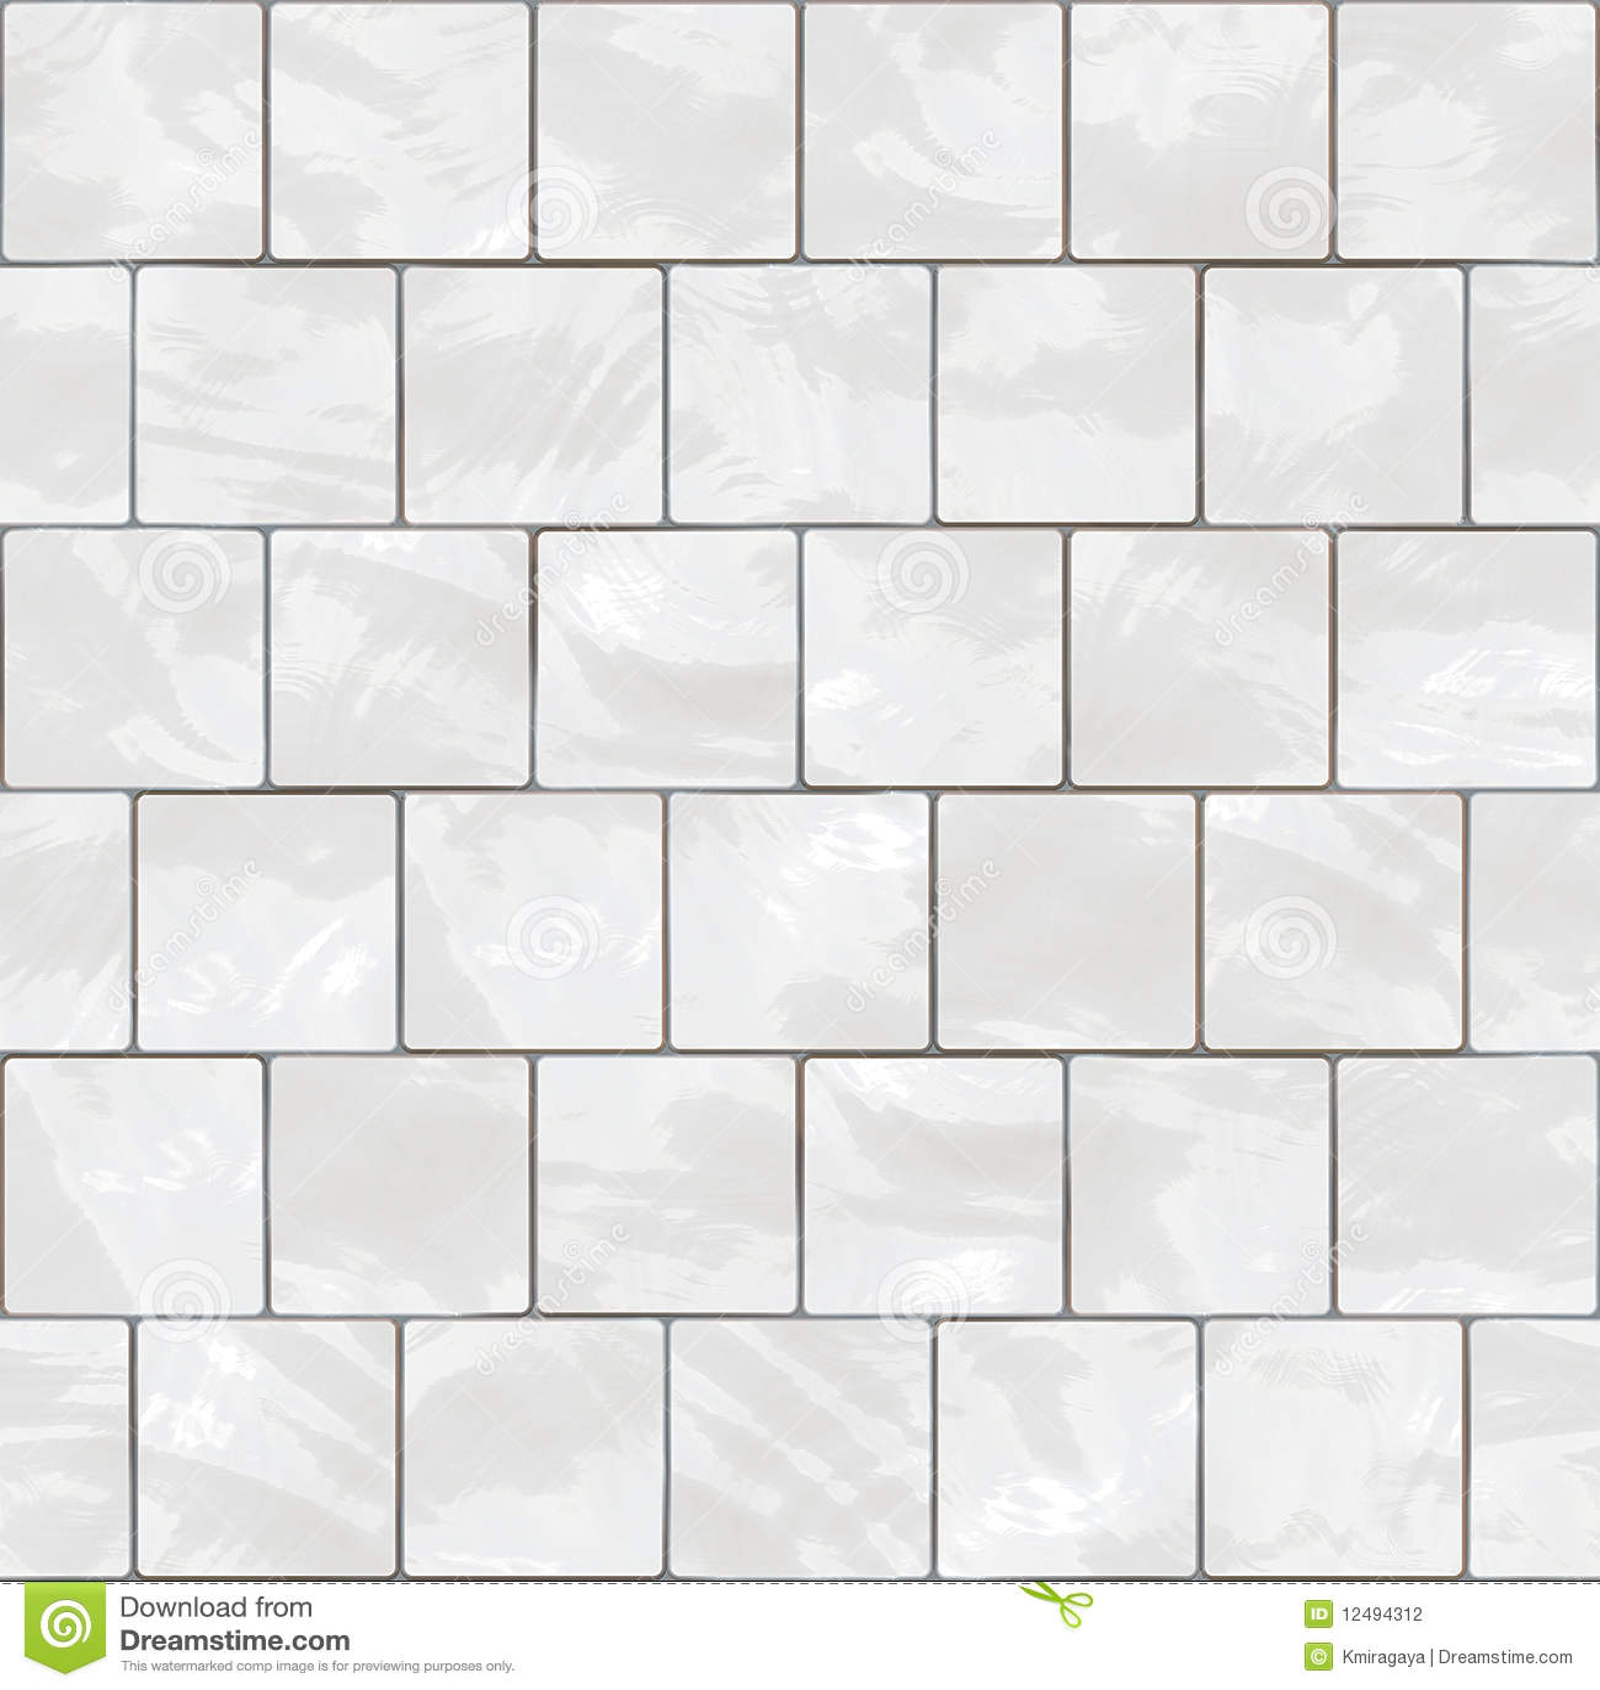 Seamless White Tiles Texture Stock Photography Image